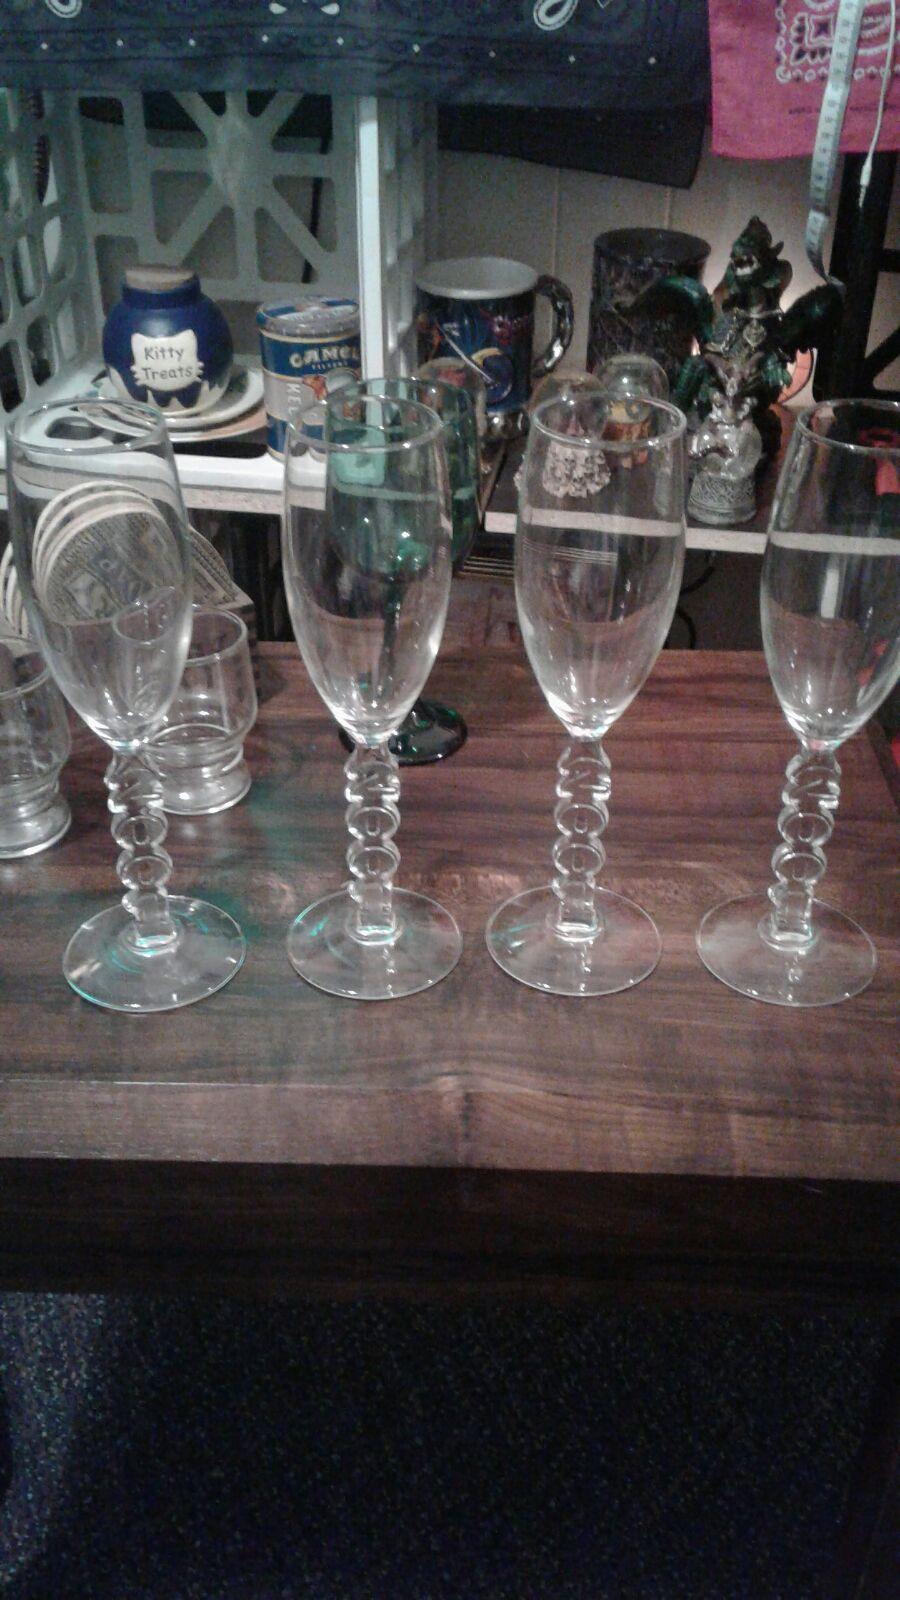 2001 Wine glasses